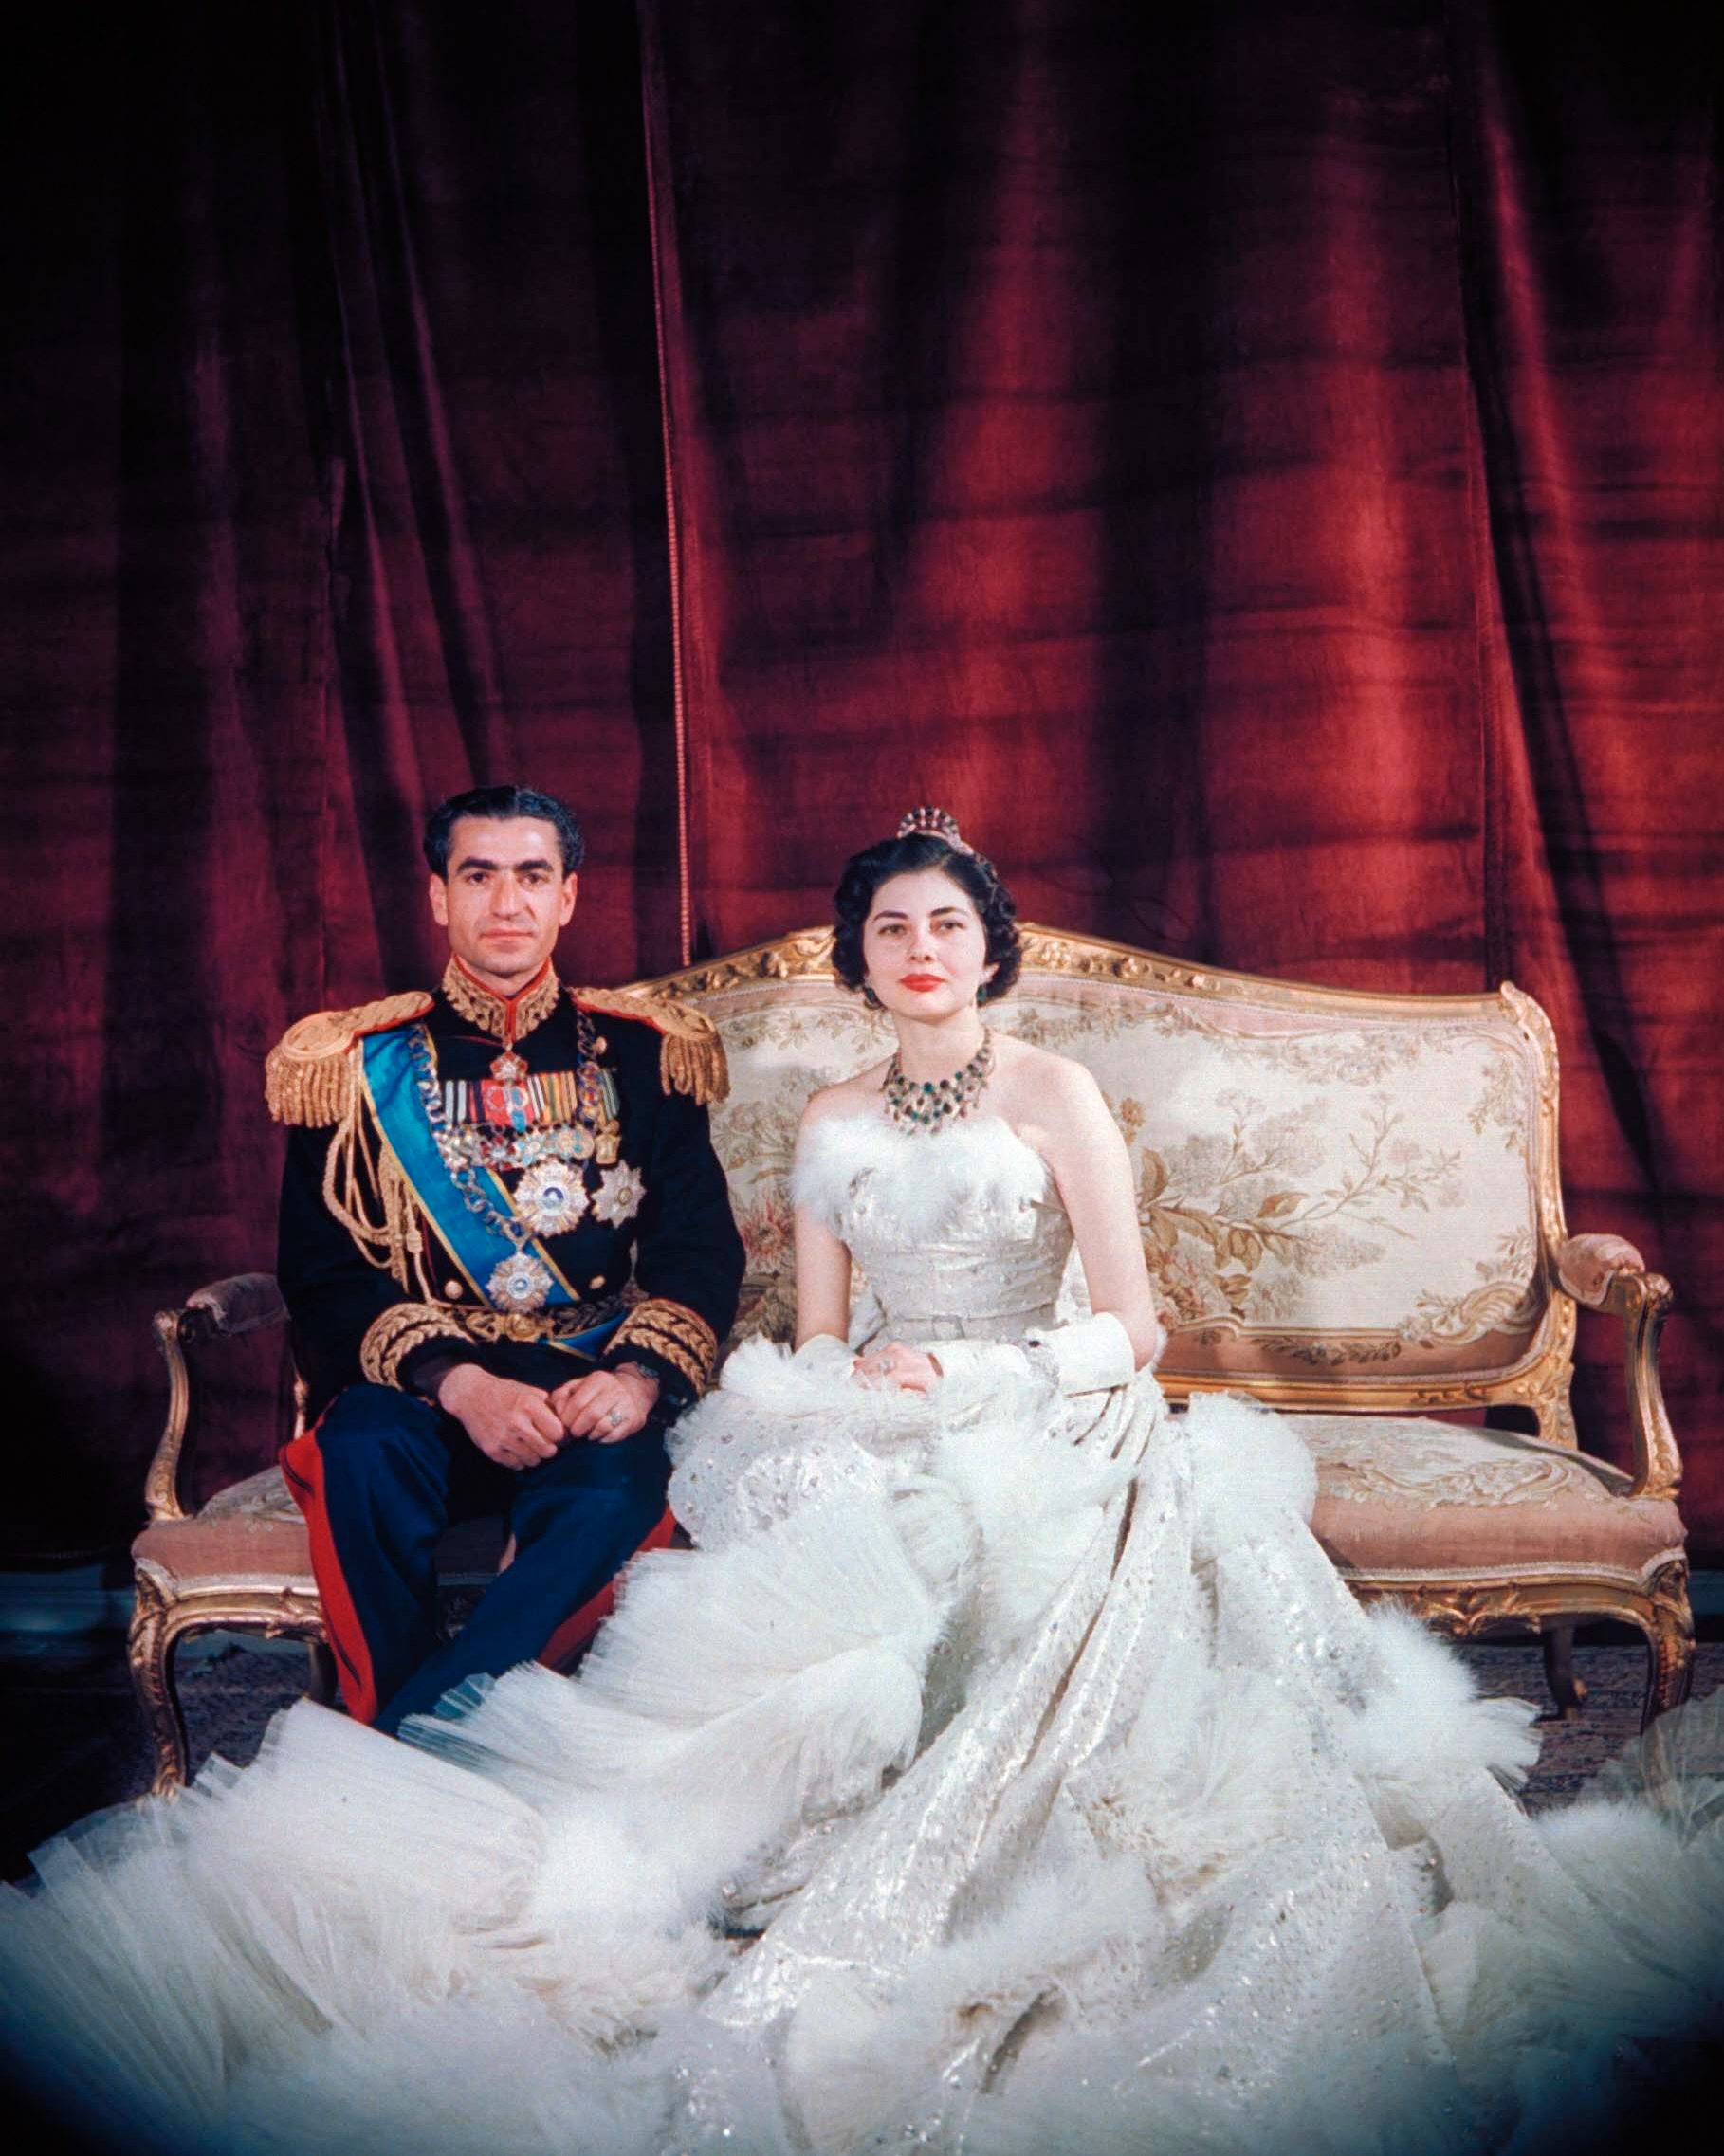 royal-wedding-dress-queen-soraya-iran-50595286-1115.jpg